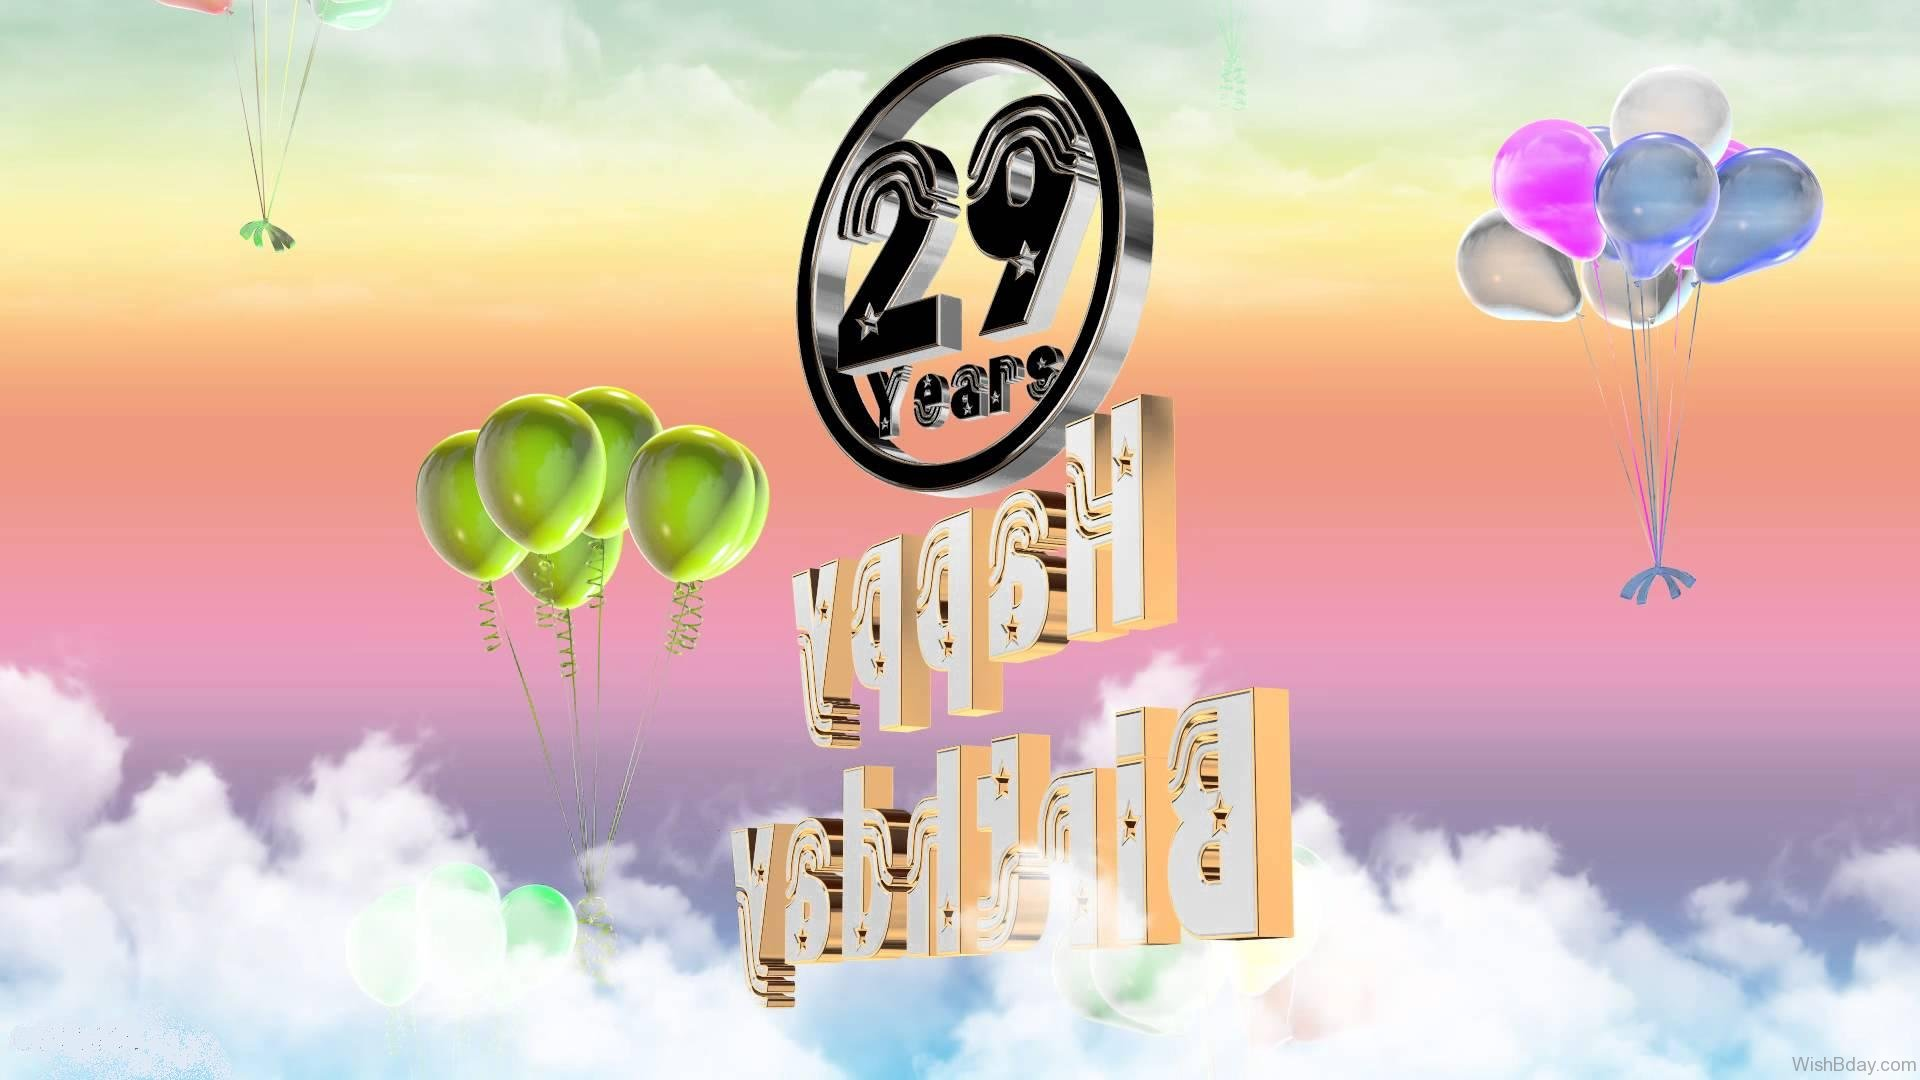 43 29th Birthday Wishes